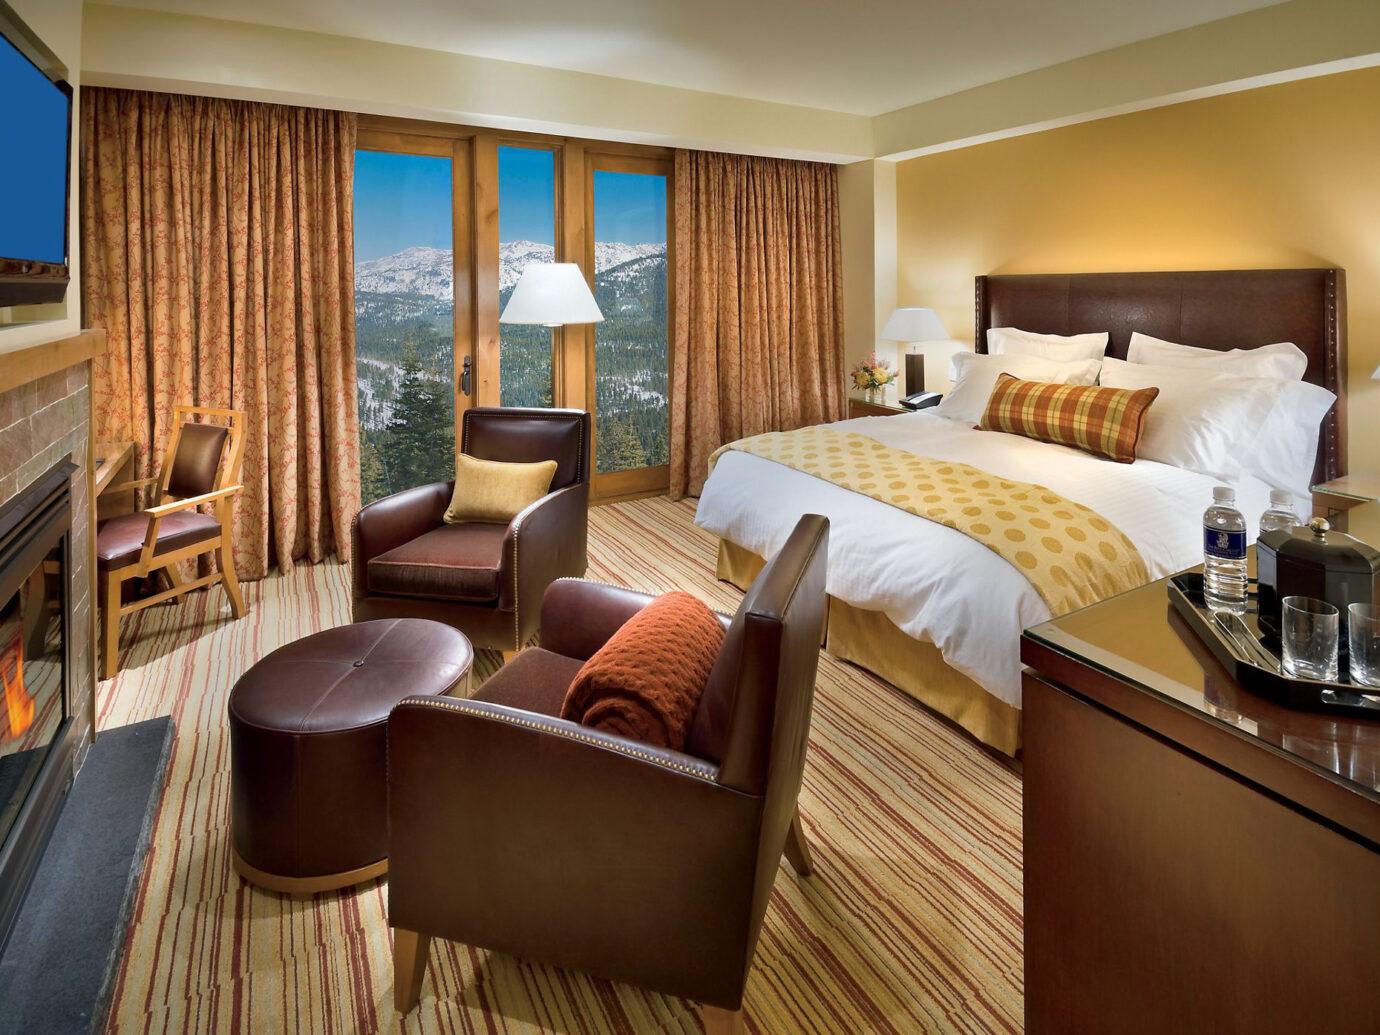 Bedroom at Ritz-Carlton Bachelor Gulch, Avon, CO